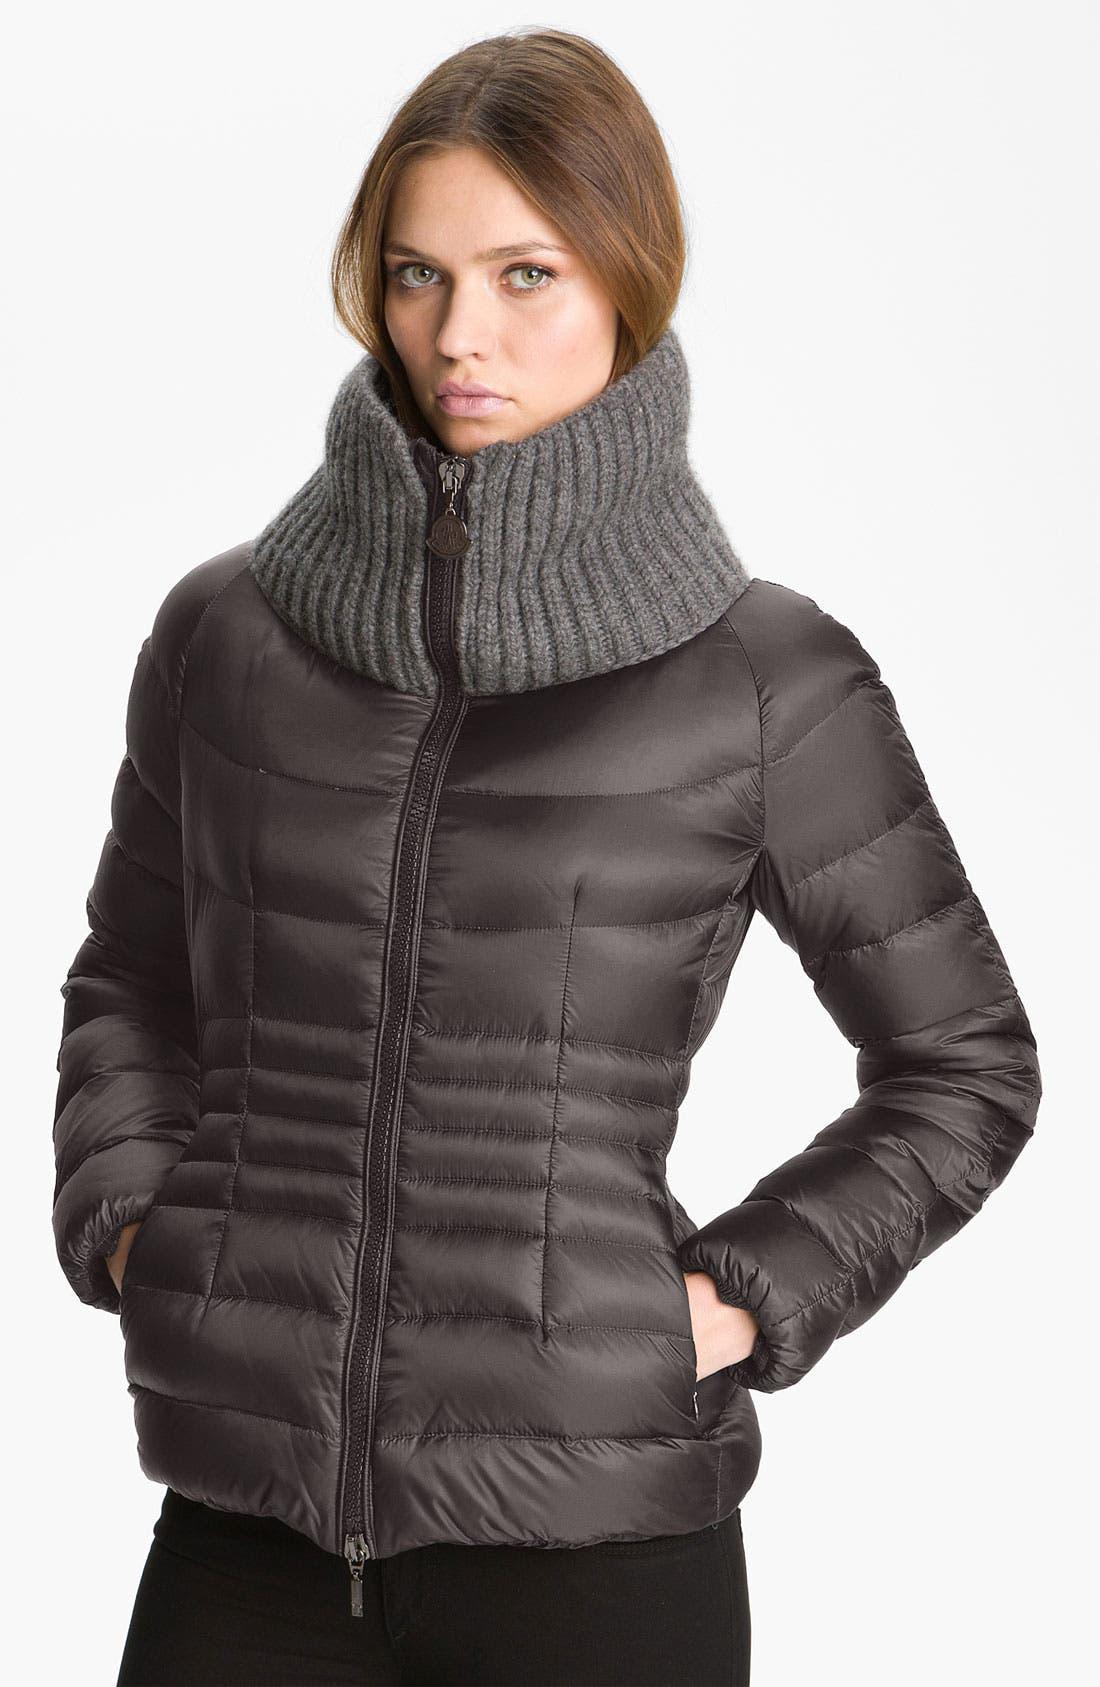 Alternate Image 1 Selected - Moncler 'Peliade' Knit Collar Down Jacket